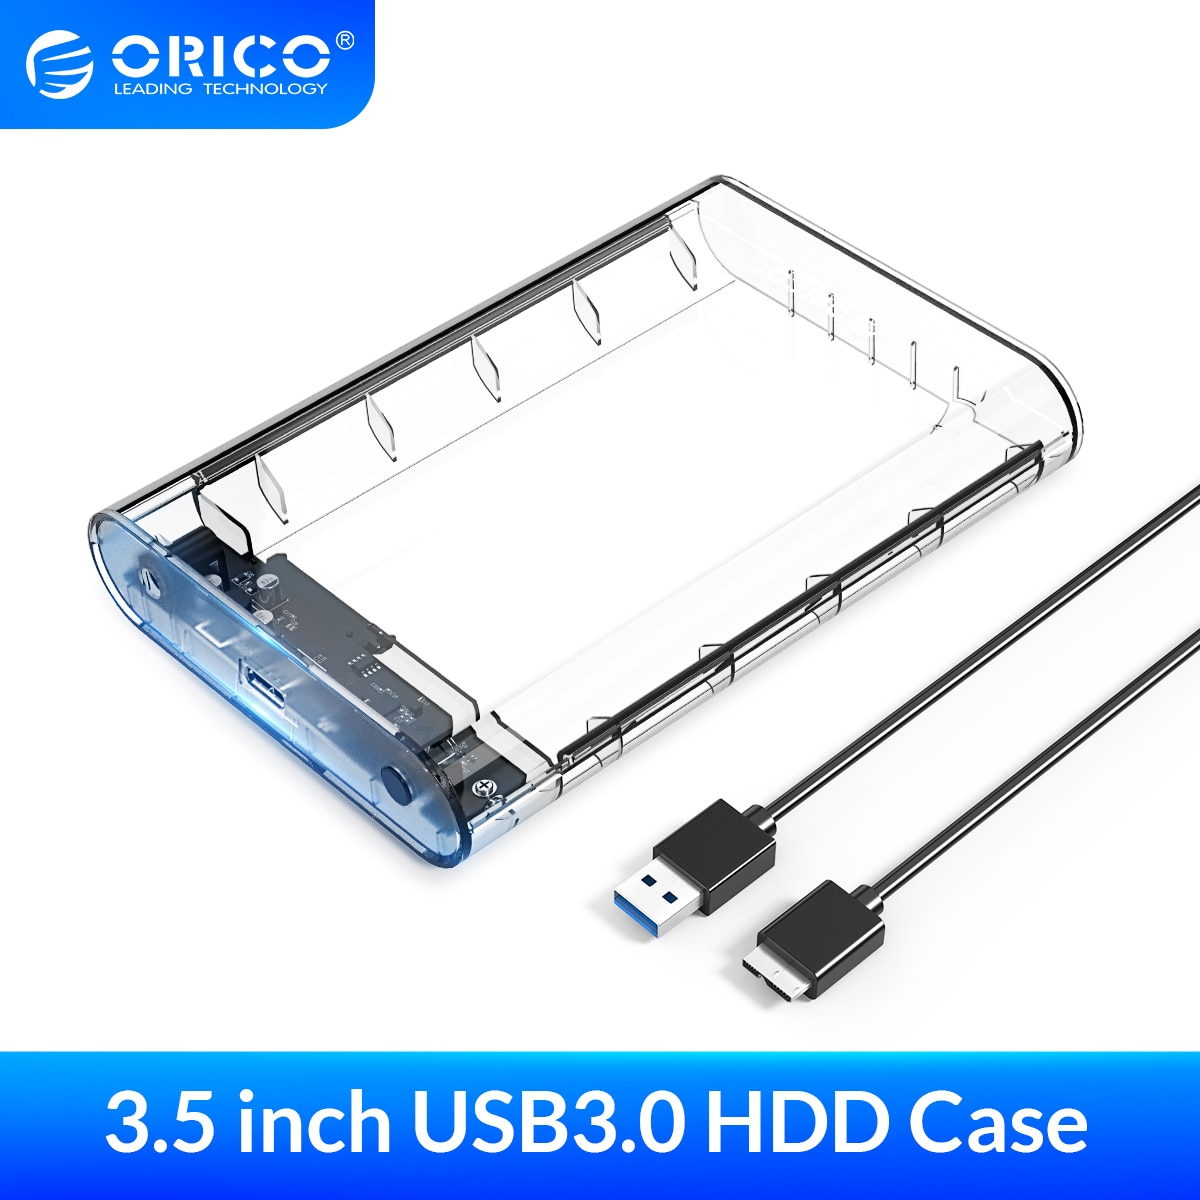 ORICO-حافظة للقرص الصلب ، 3.5 USB3.0 إلى SATA3.0, محول خارجي ، متوافق مع بروتوكول UASP 8 تيرا بايت ، 2.5 3.5 HDD SSD